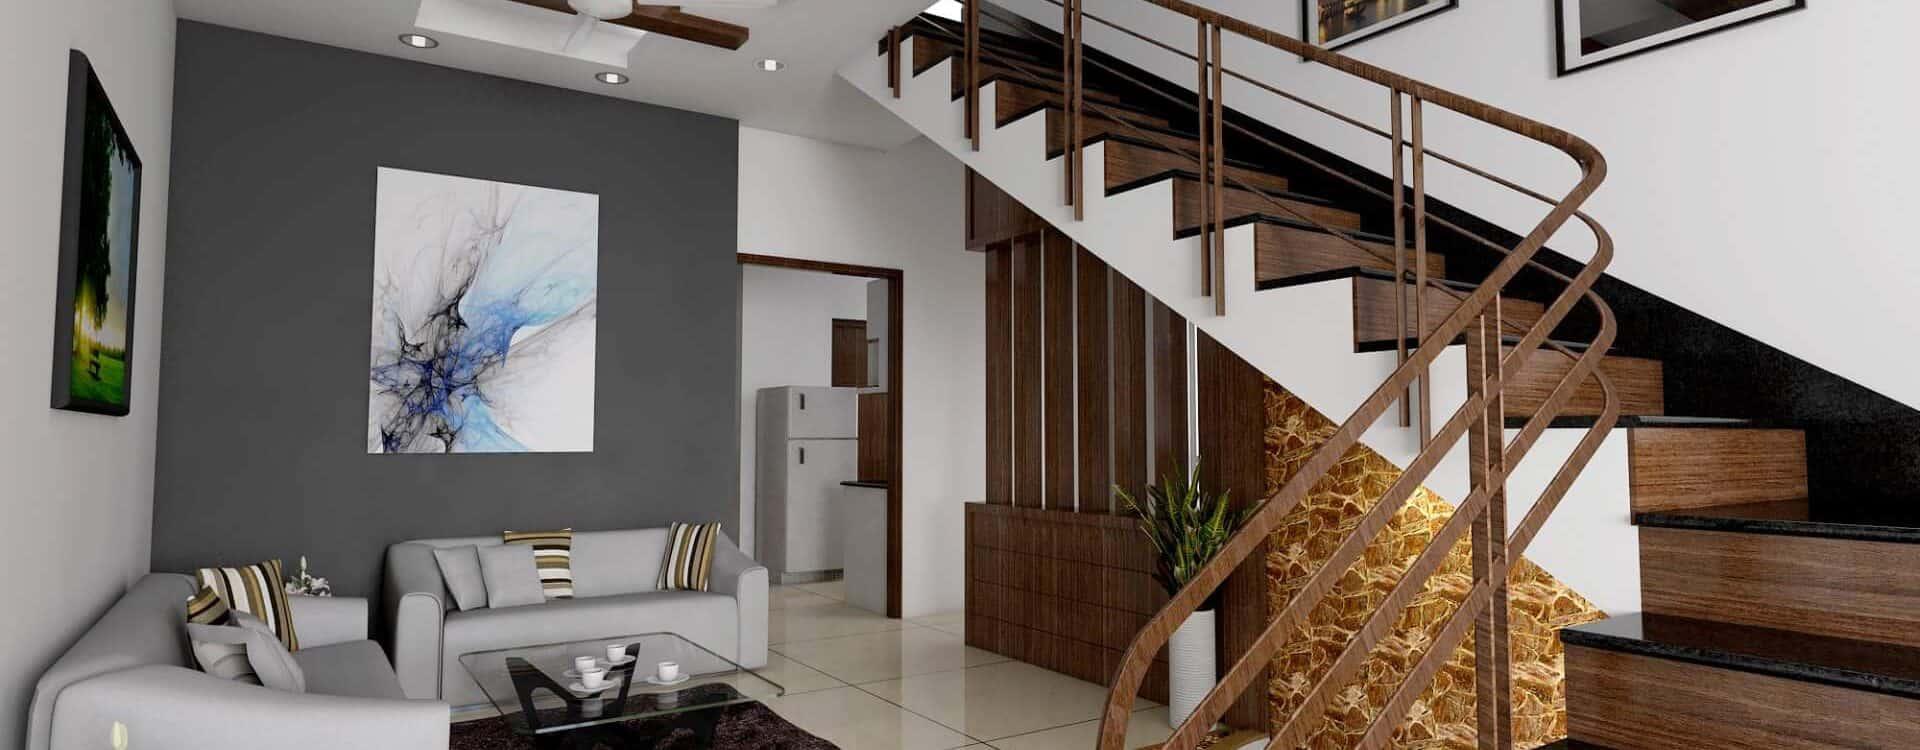 Mr. Bhandarkars Residence at Bengaluru